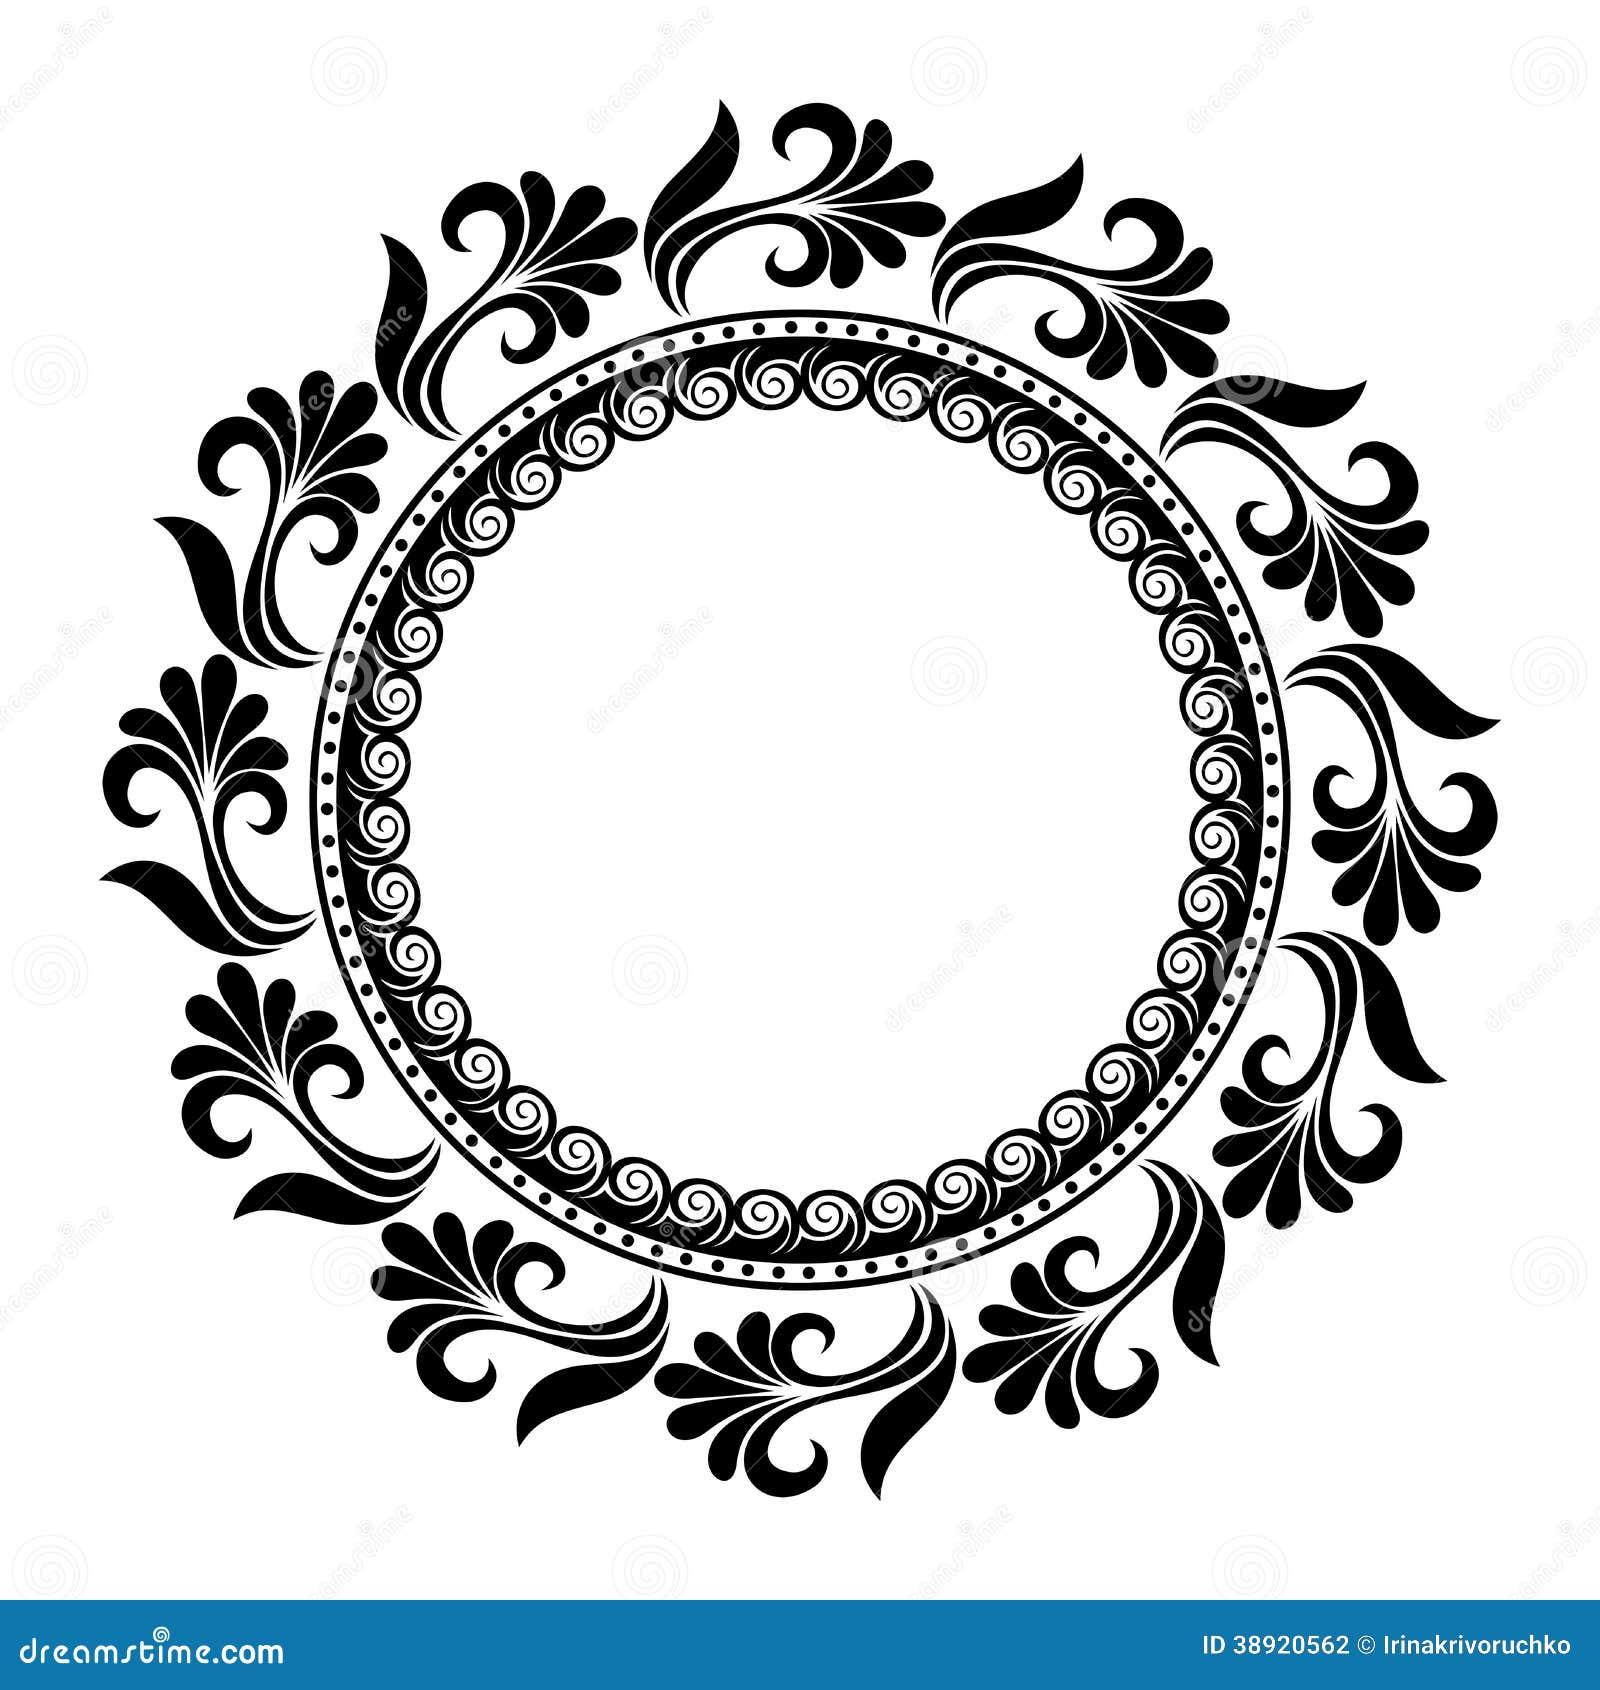 Diamond Ring Clipart